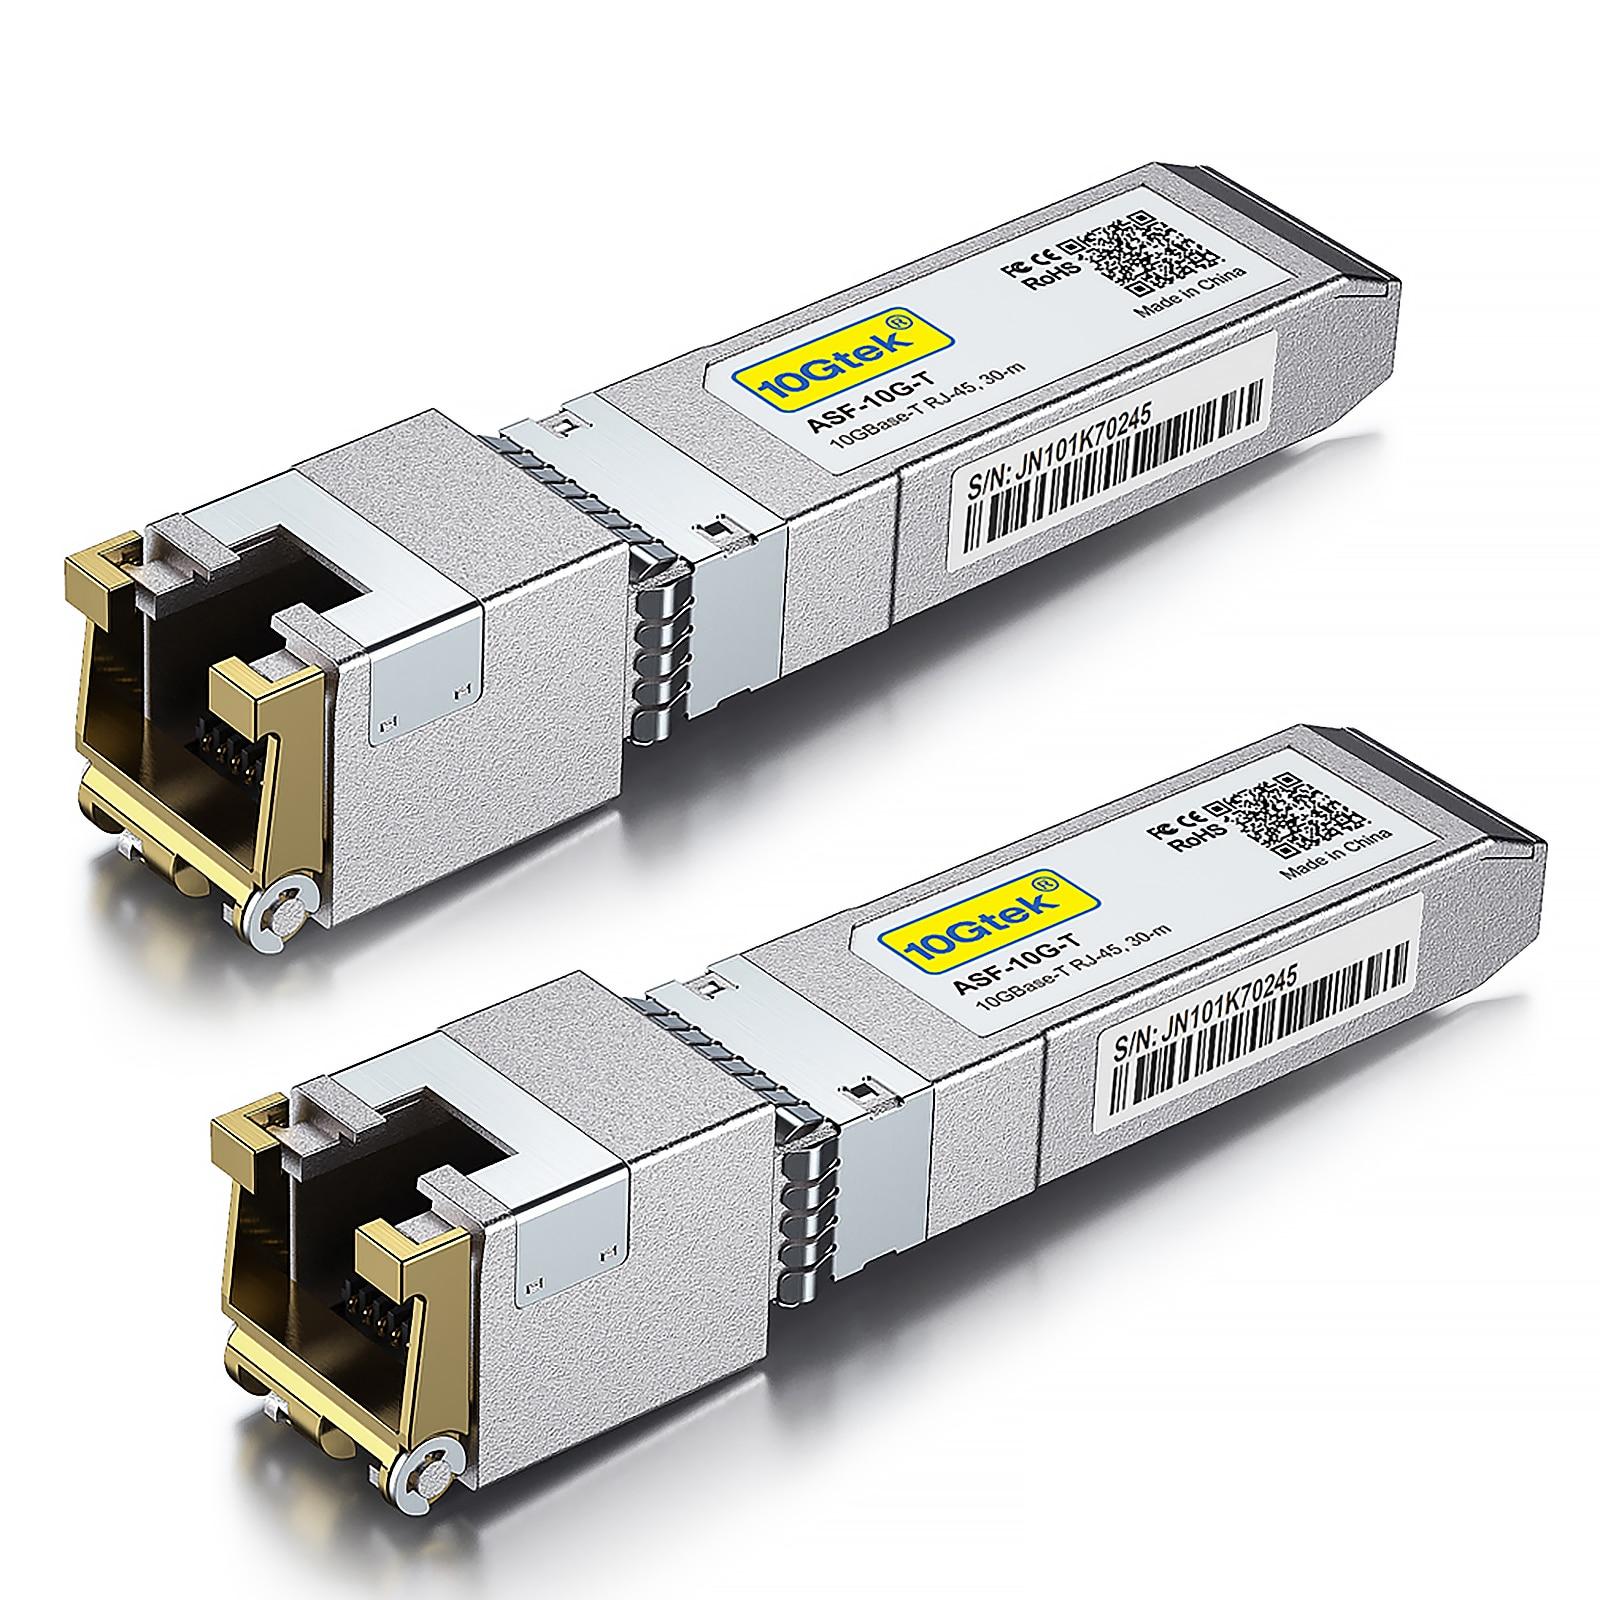 10GBASE-T 10G SFP + إلى RJ45 النحاس الإرسال والاستقبال وحدة سيسكو SFP-10G-T-S حزمة من 2